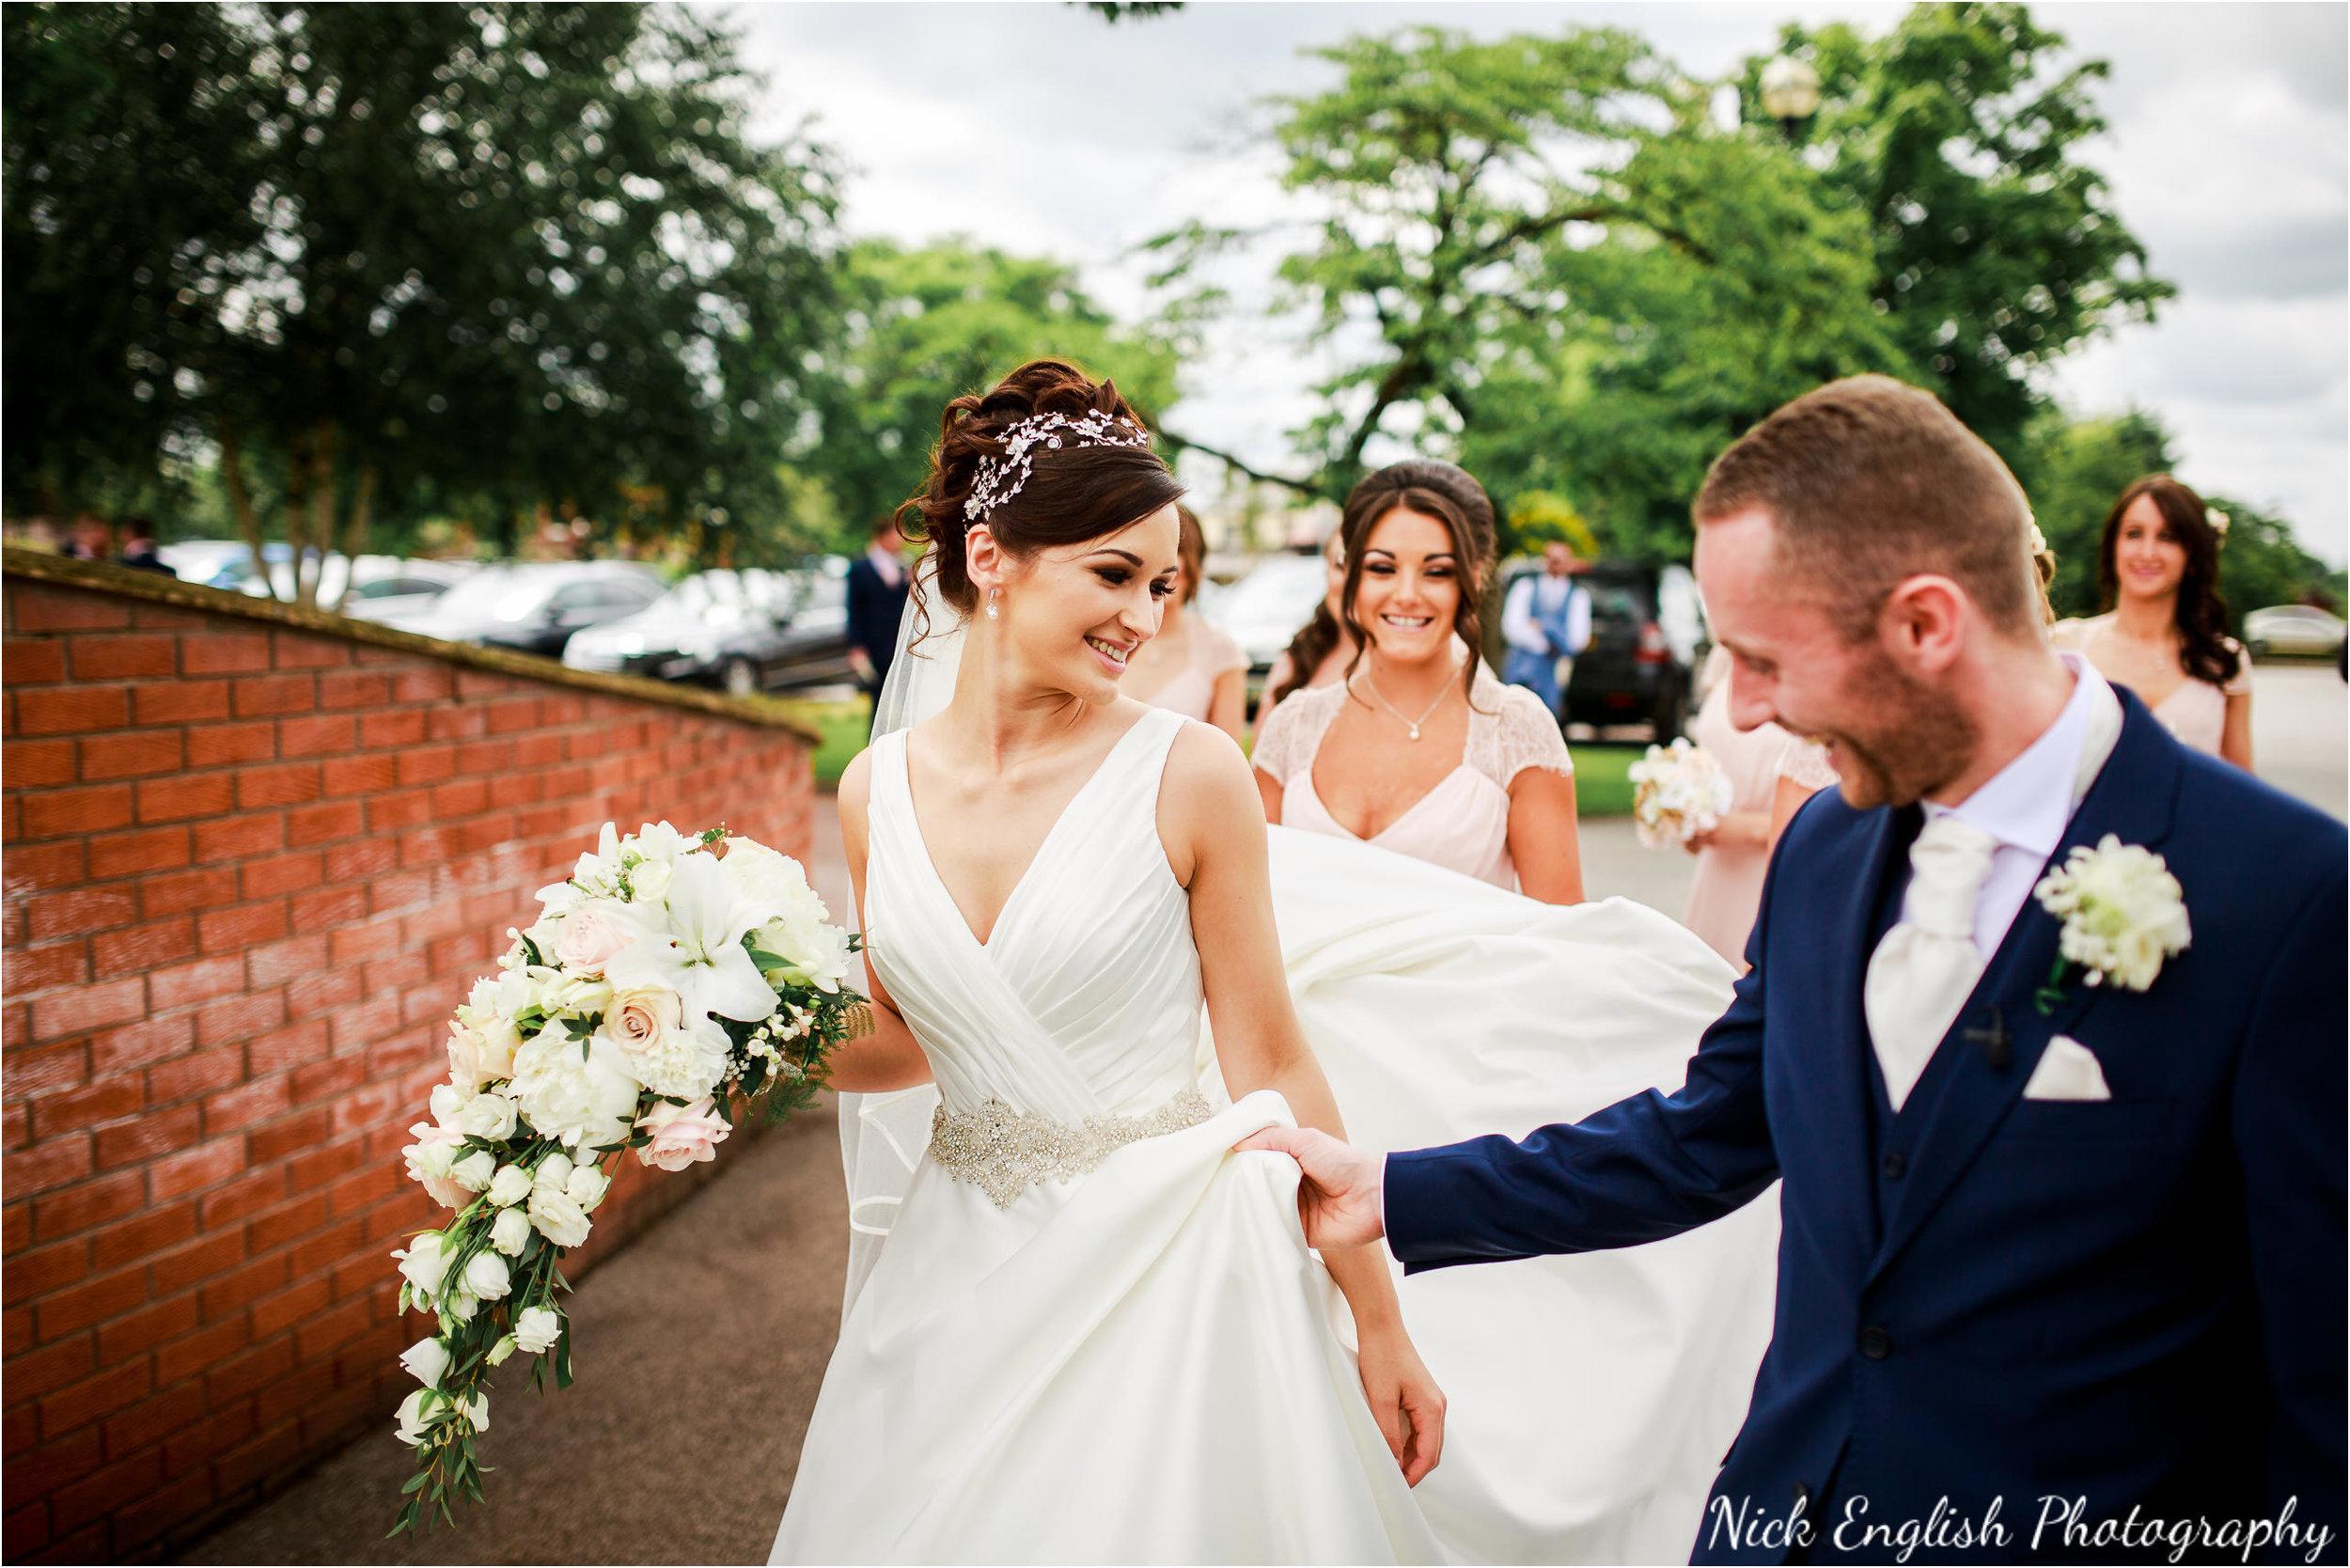 Emily David Wedding Photographs at Barton Grange Preston by Nick English Photography 87jpg.jpeg